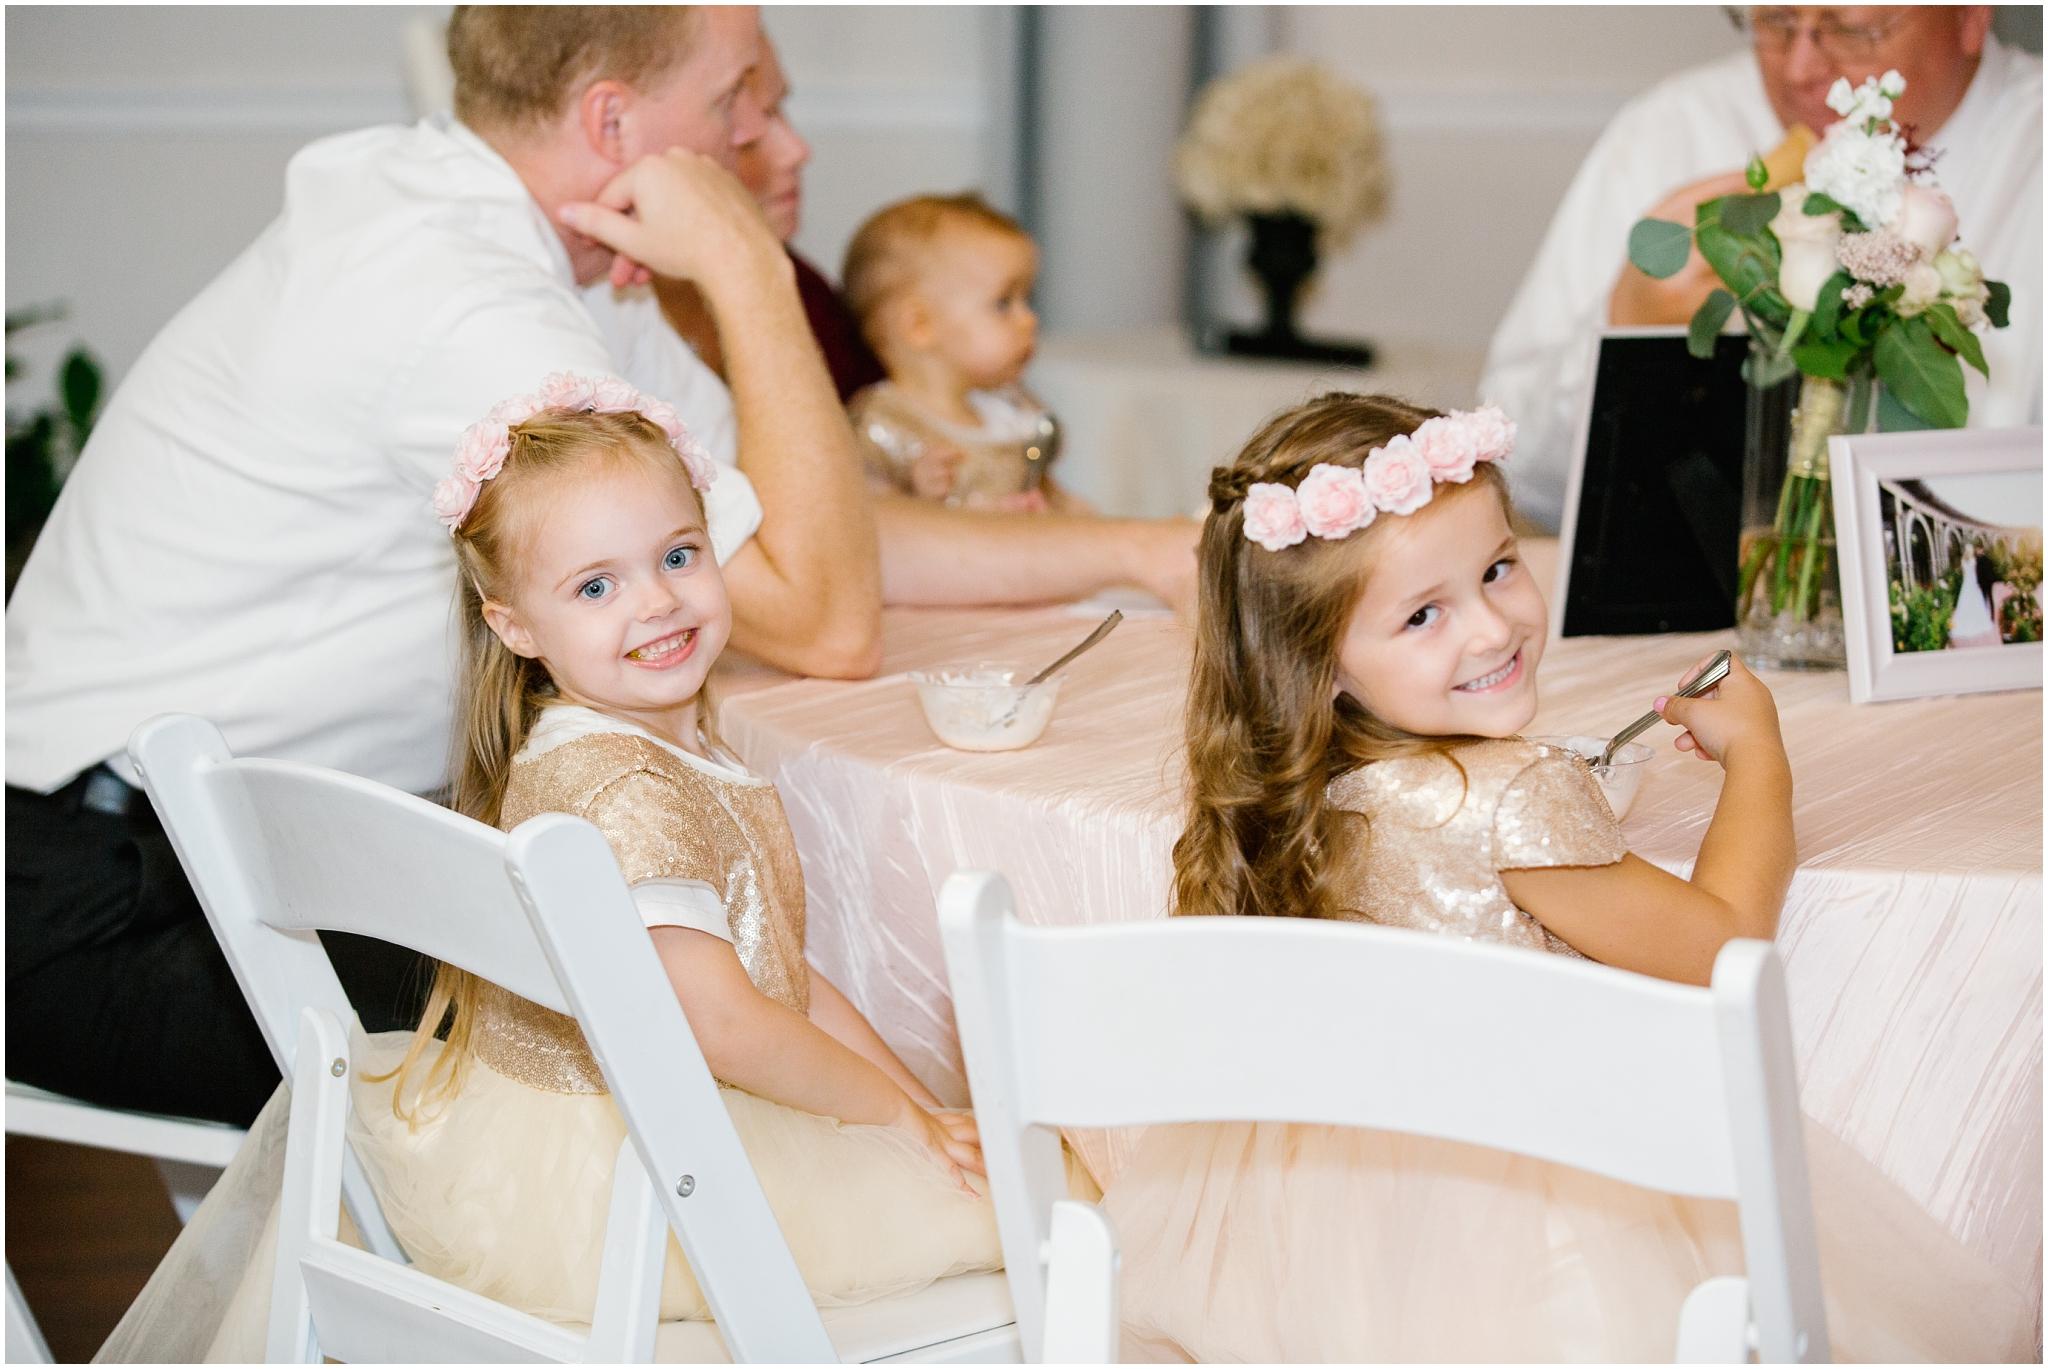 HannahChaseWedding-371_Lizzie-B-Imagery-Utah-Wedding-Photographer-Park-City-Salt-Lake-City-Payson-Temple-Clarion-Garden-Center.jpg